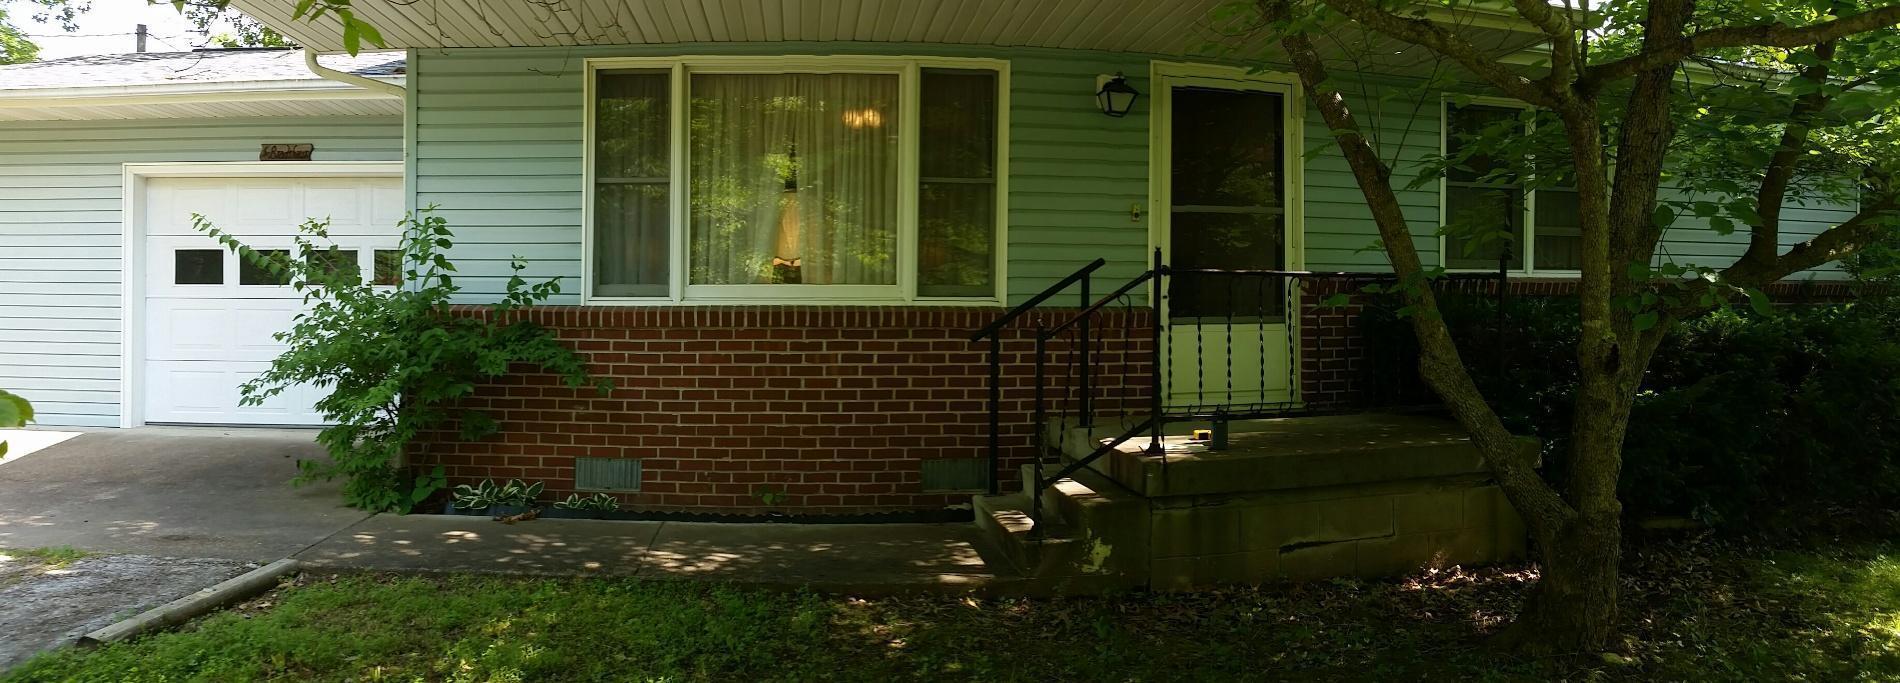 644 Wayland Drive Forsyth, MO 65653